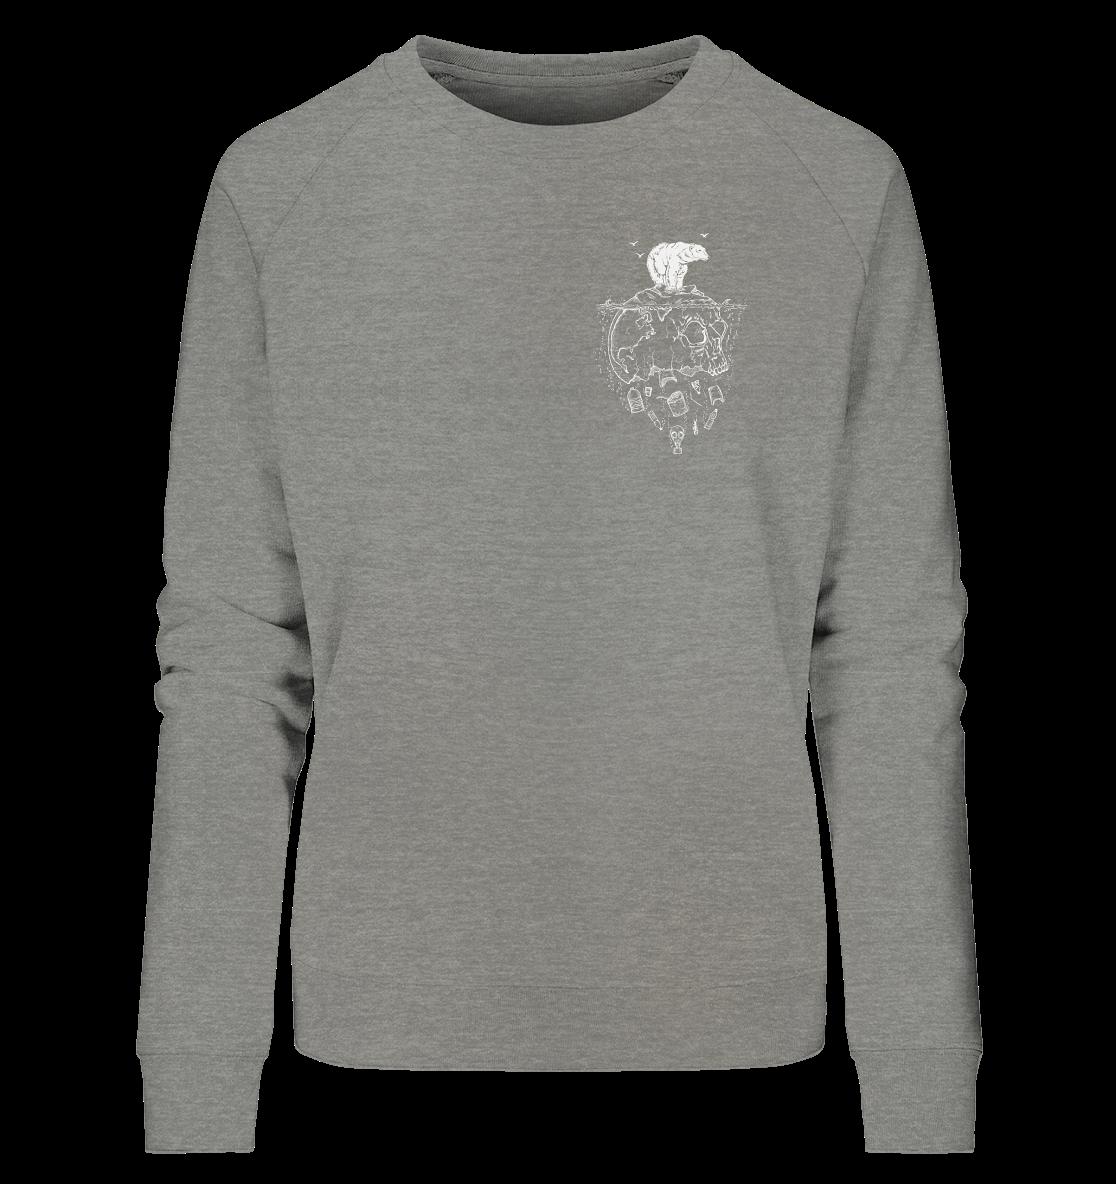 front-ladies-organic-sweatshirt-818381-1116x-33.png